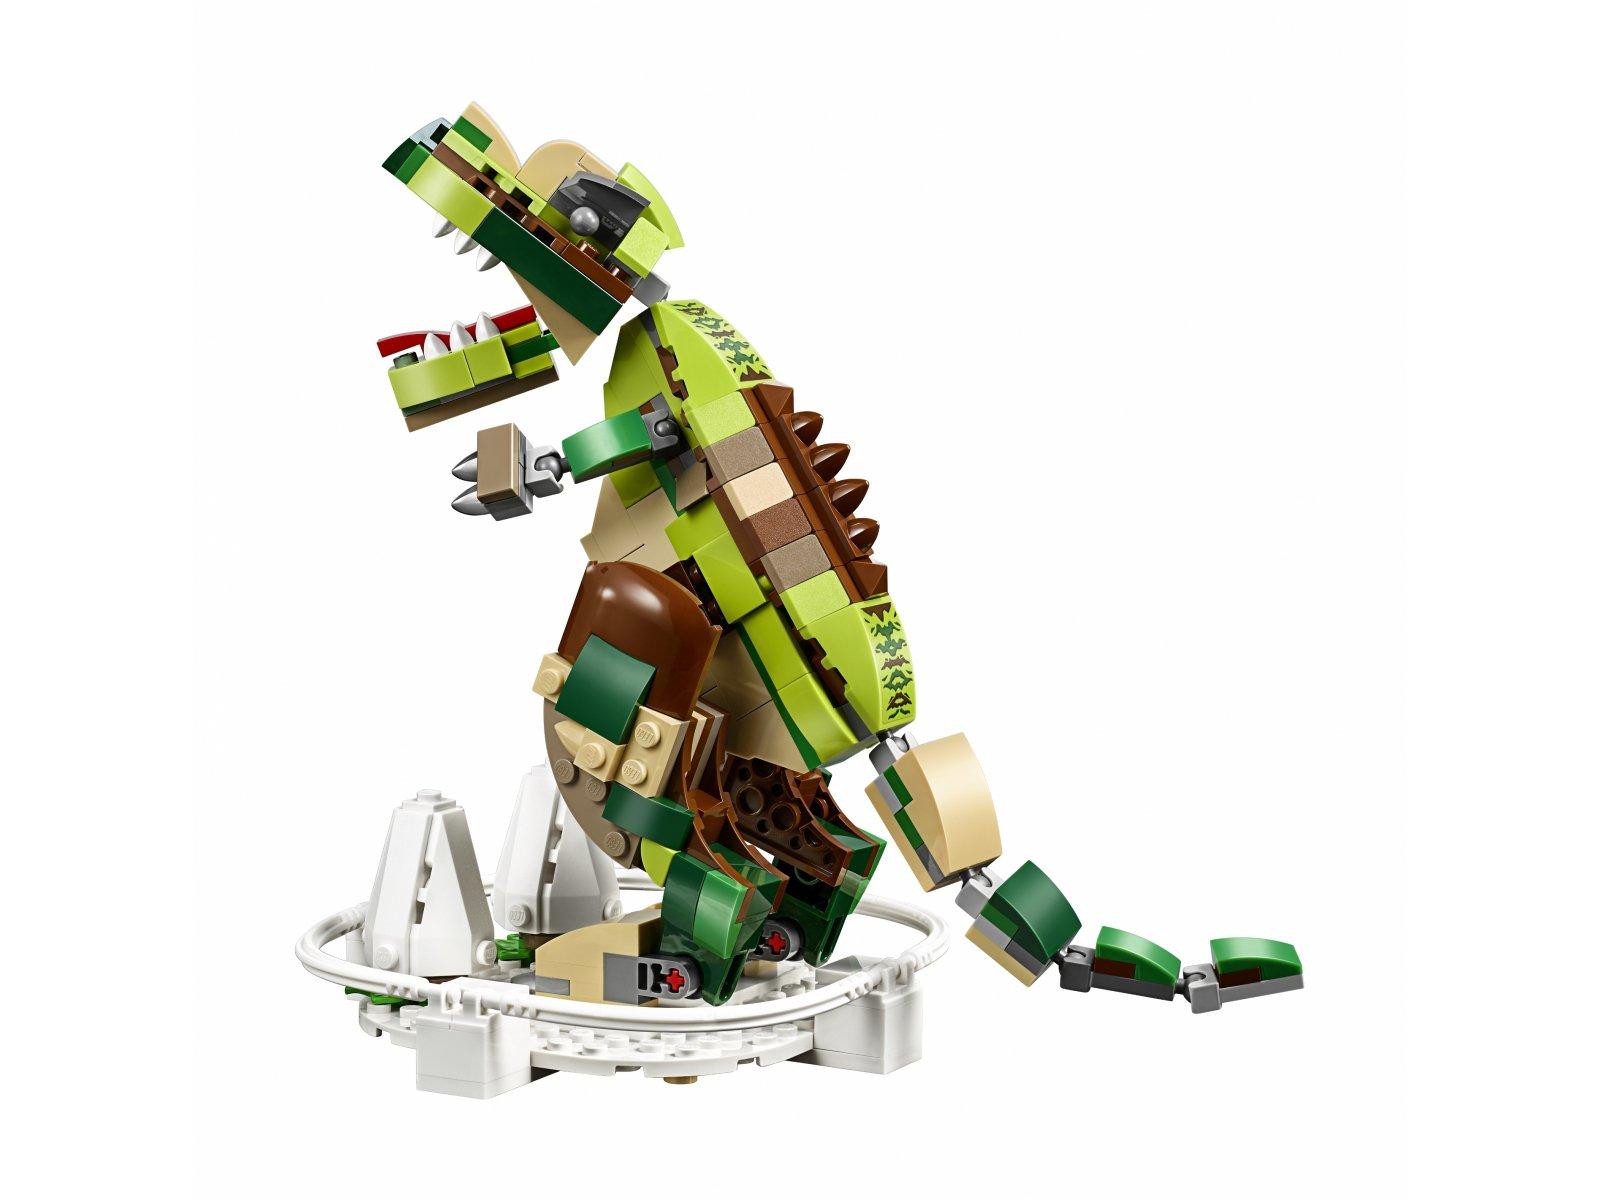 LEGO 40366 Dinosaurs